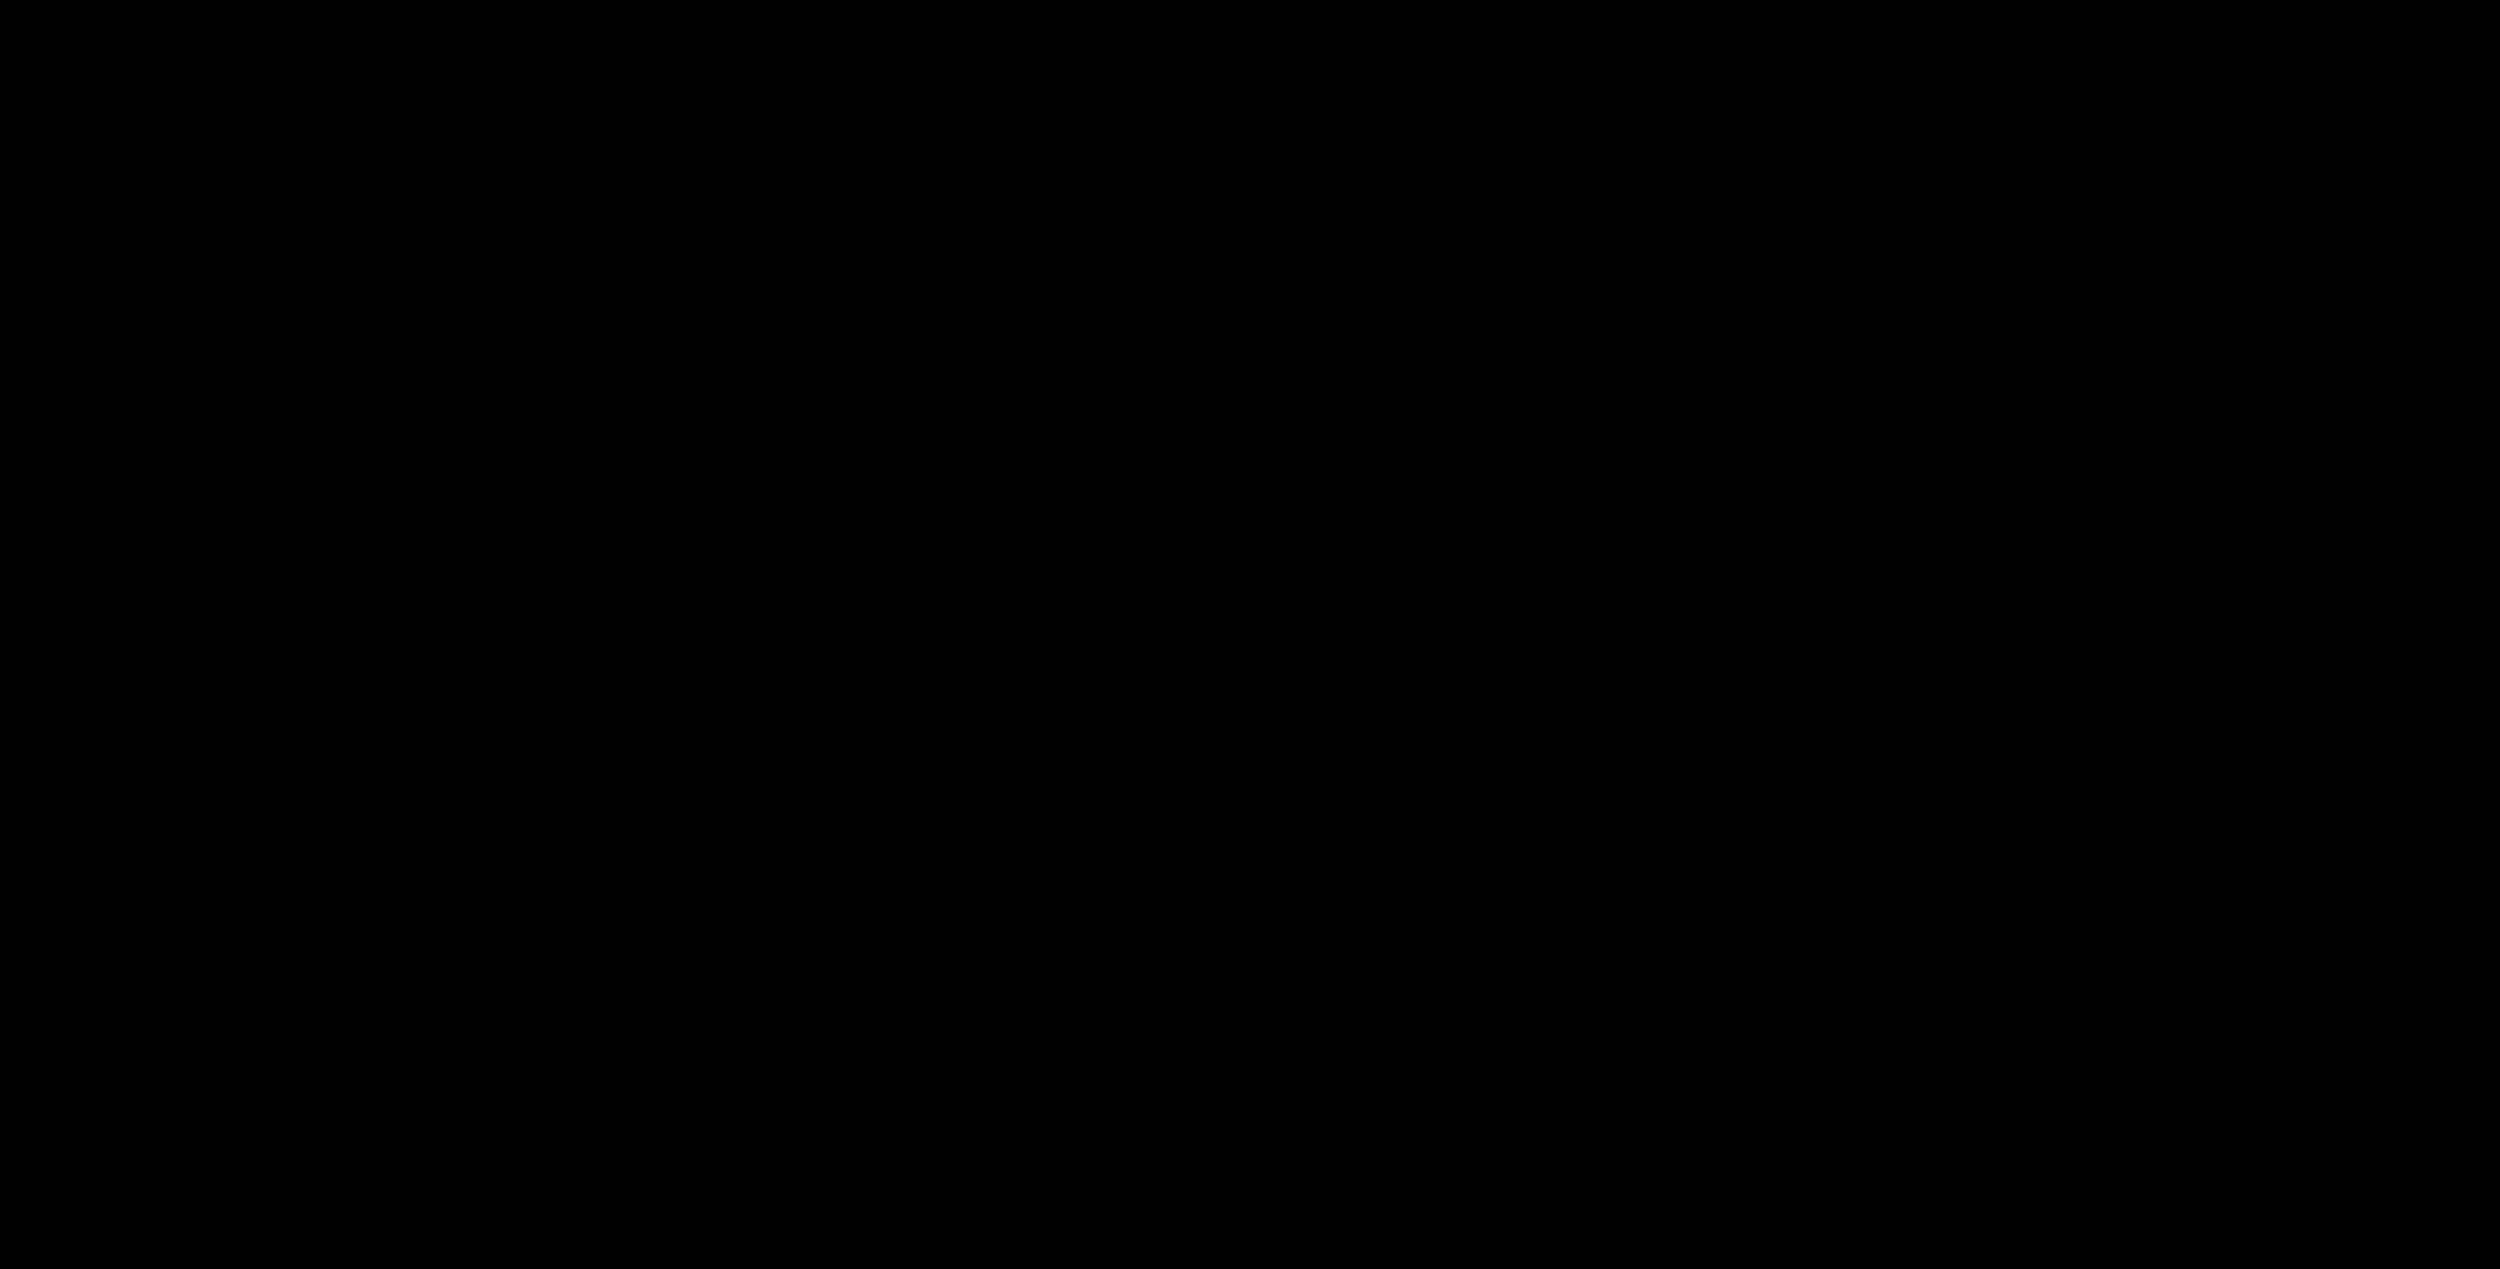 la manievelle logo.png